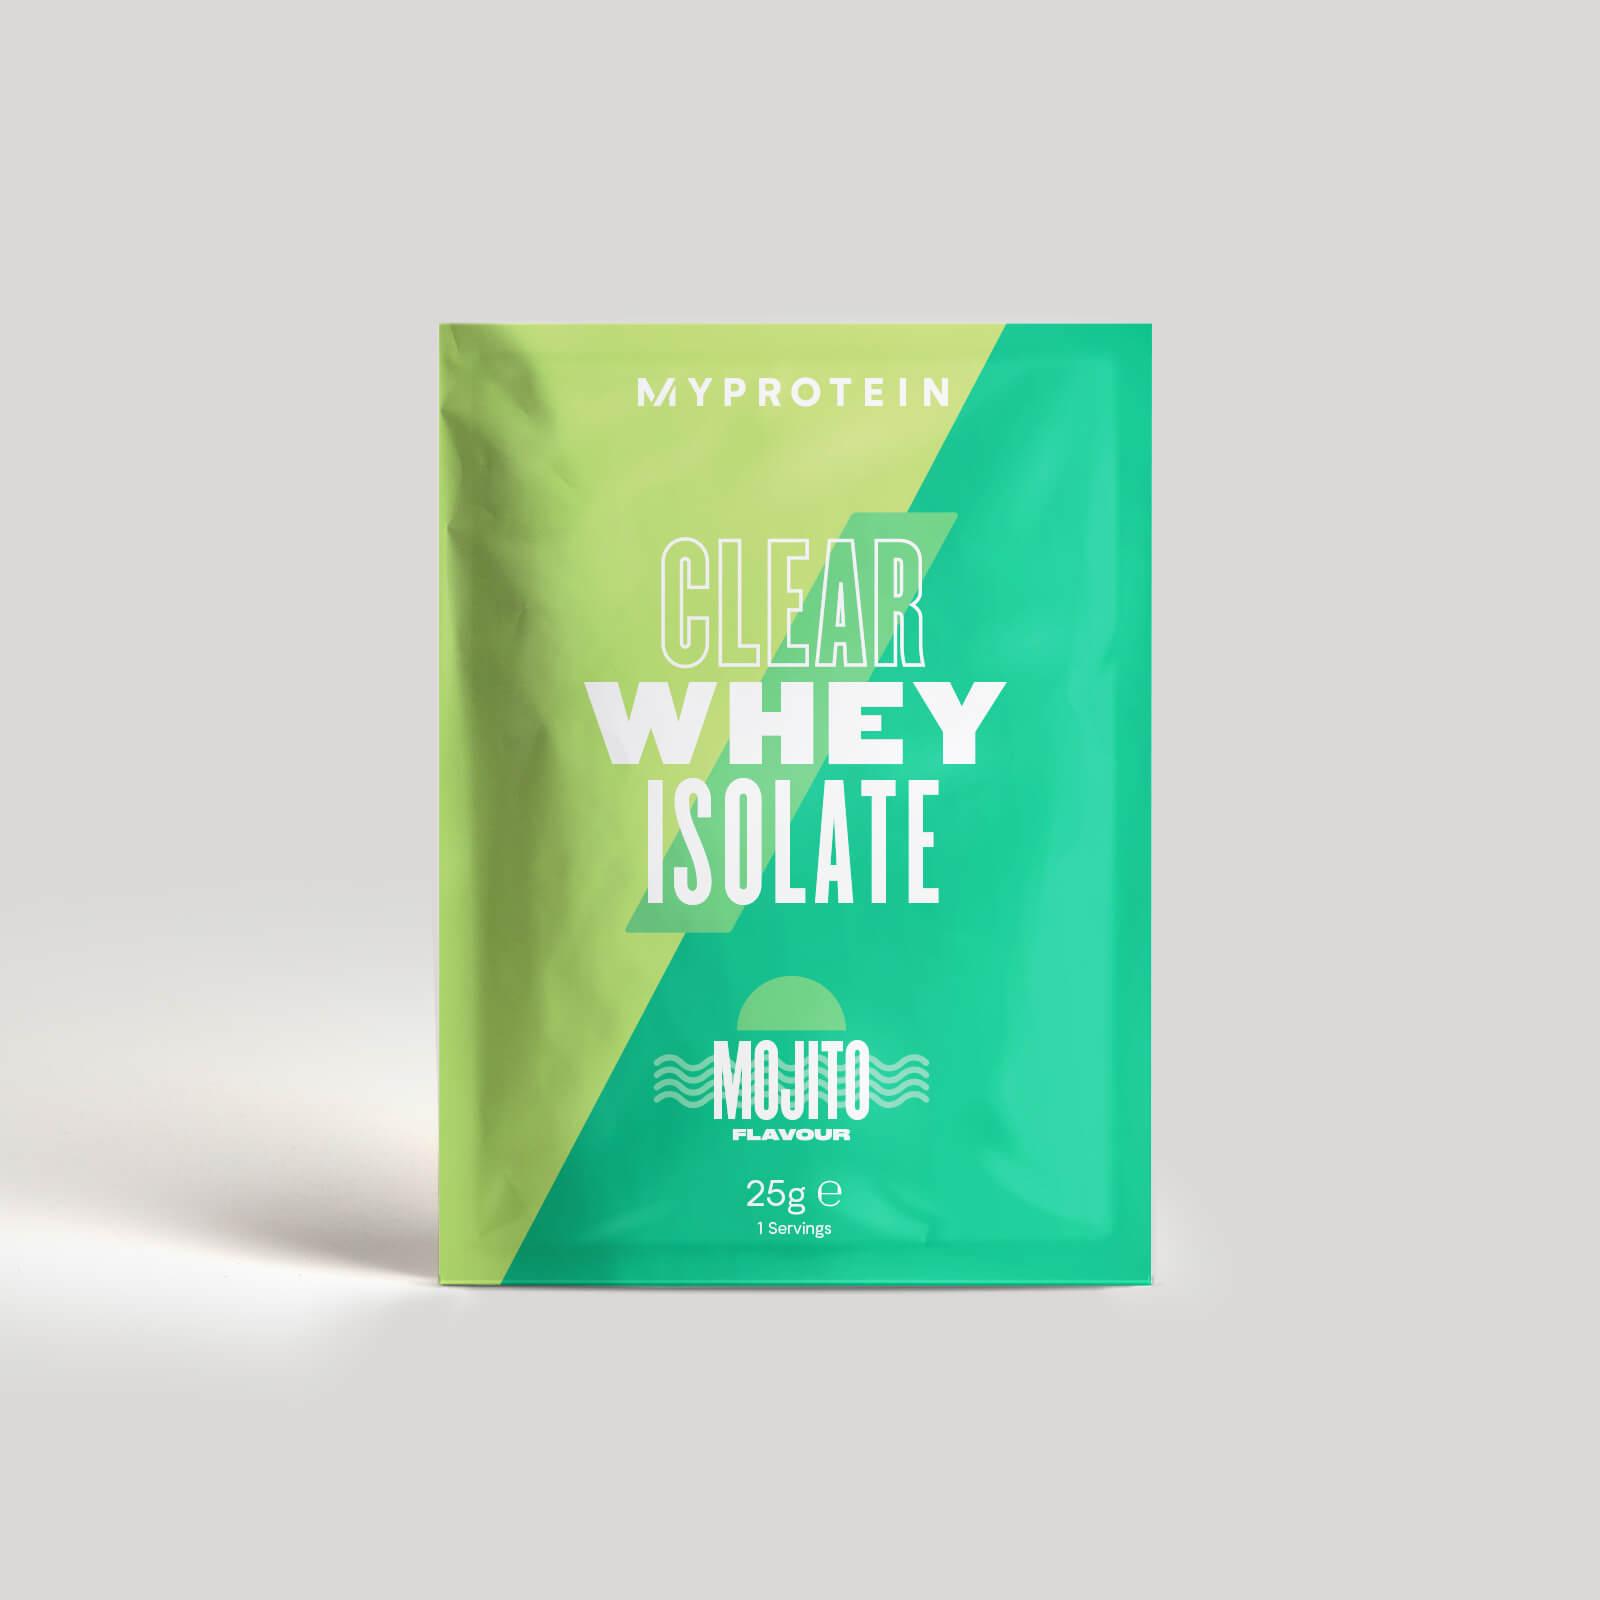 Myprotein Clear Whey Isolate (Échantillon) - 25g - Mojito